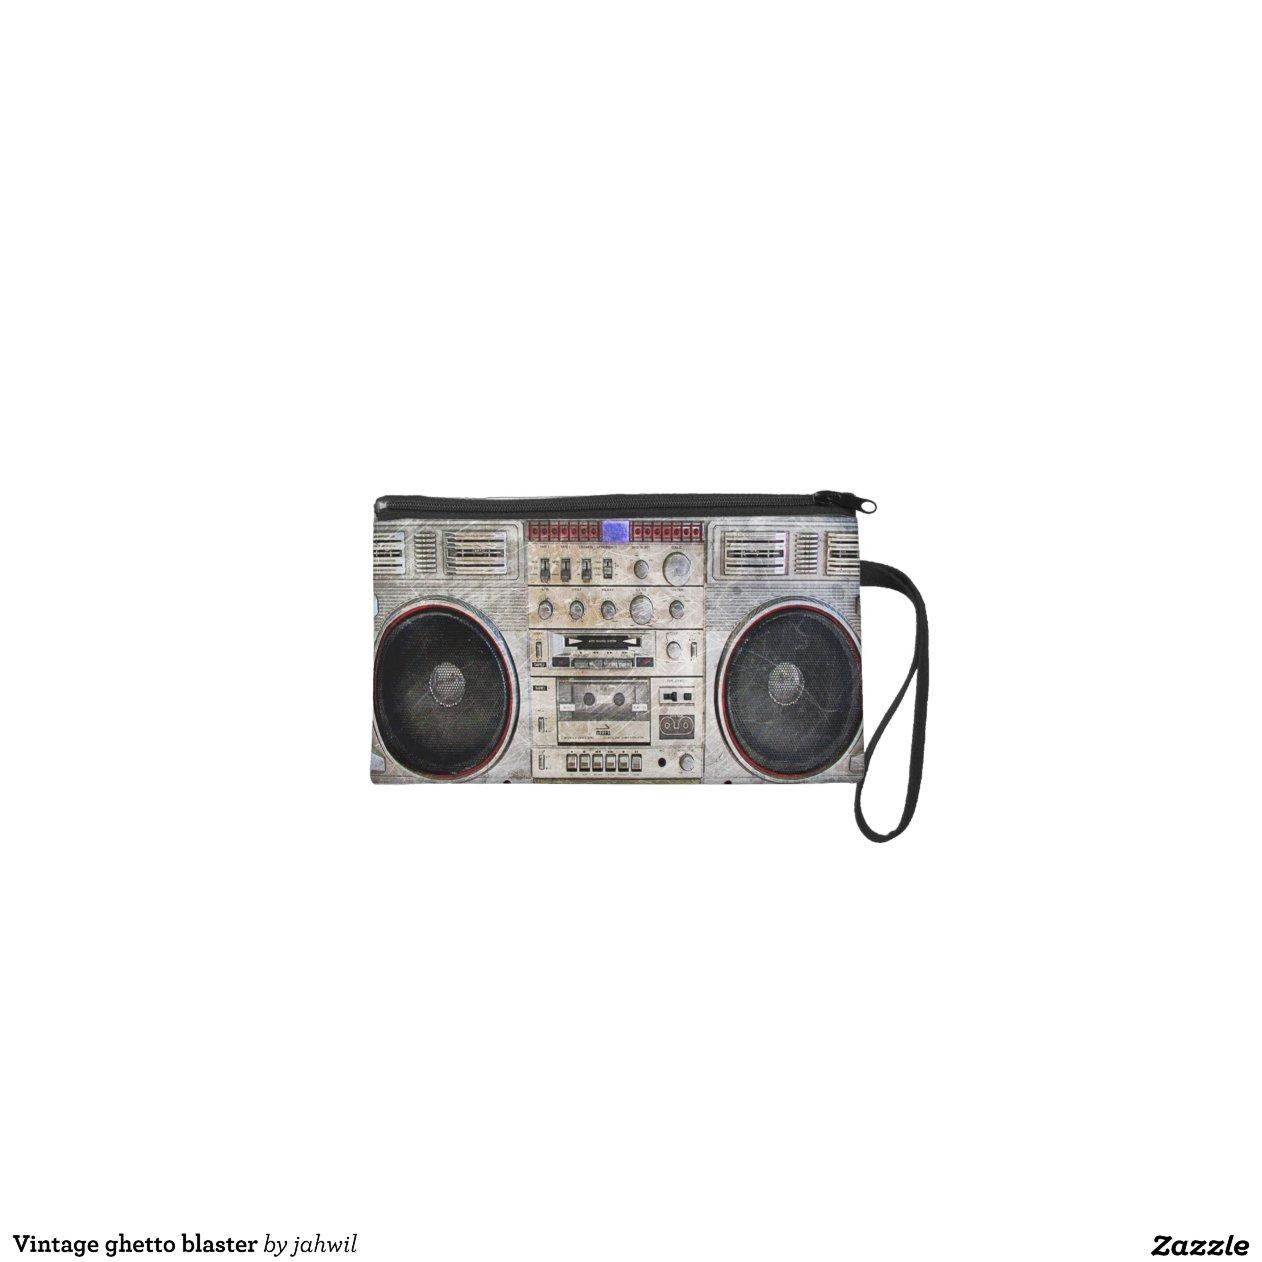 Vintage ghetto blaster zazzle - Ghetto blaster acheter ...